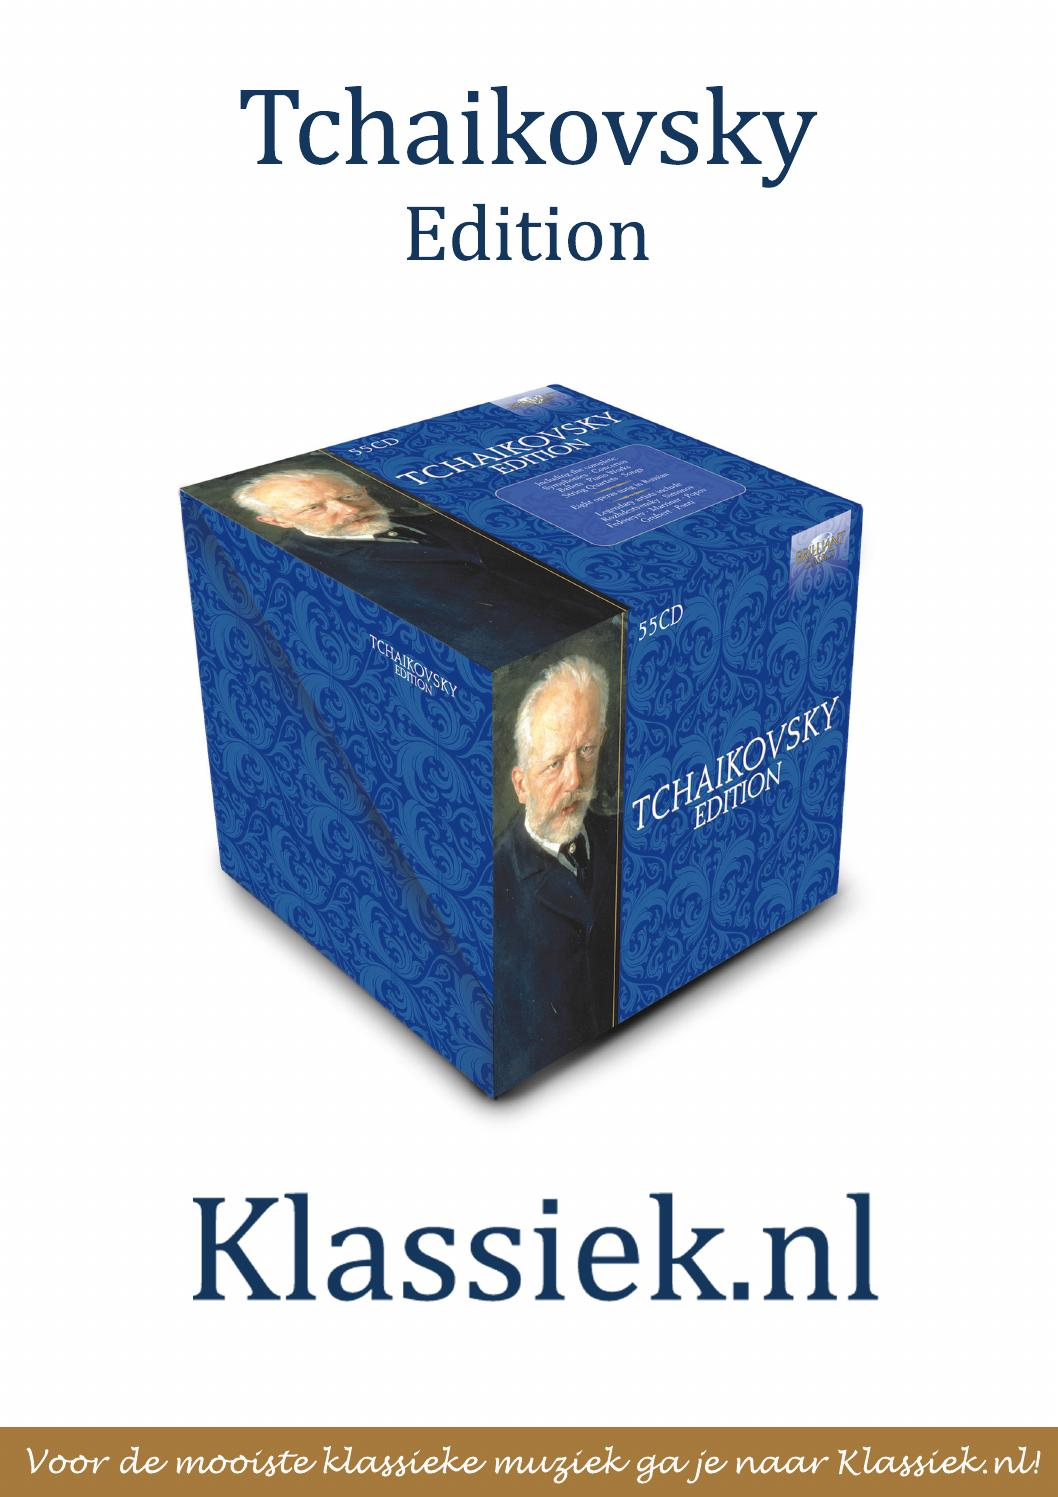 Tchaikovsky Edition By Klassieknl Issuu